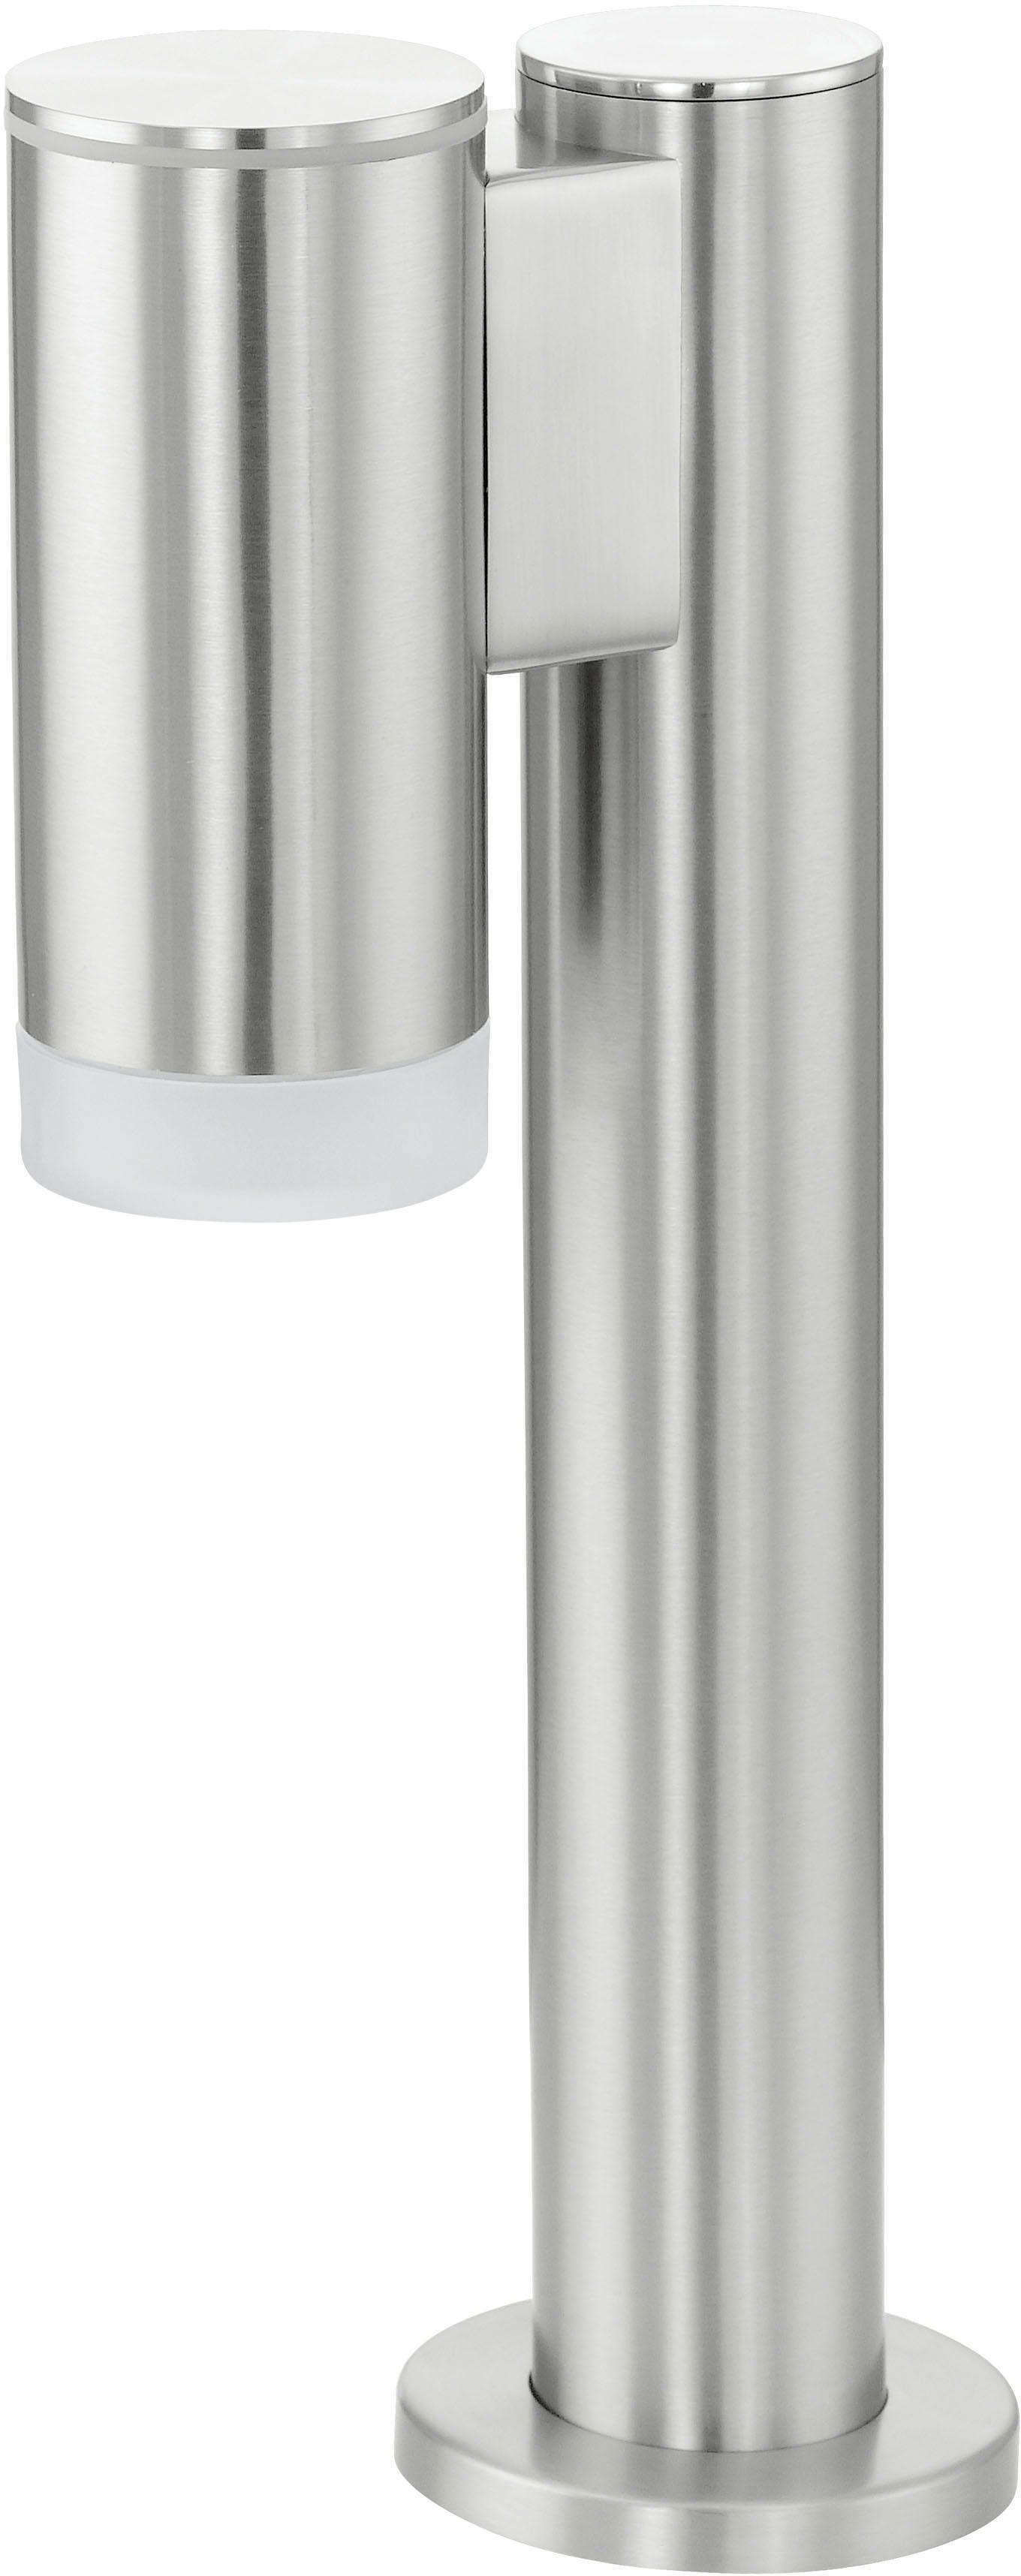 Eglo LED Außenleuchte, 1 flg., Sockelleuchte, »RIGA-LED«